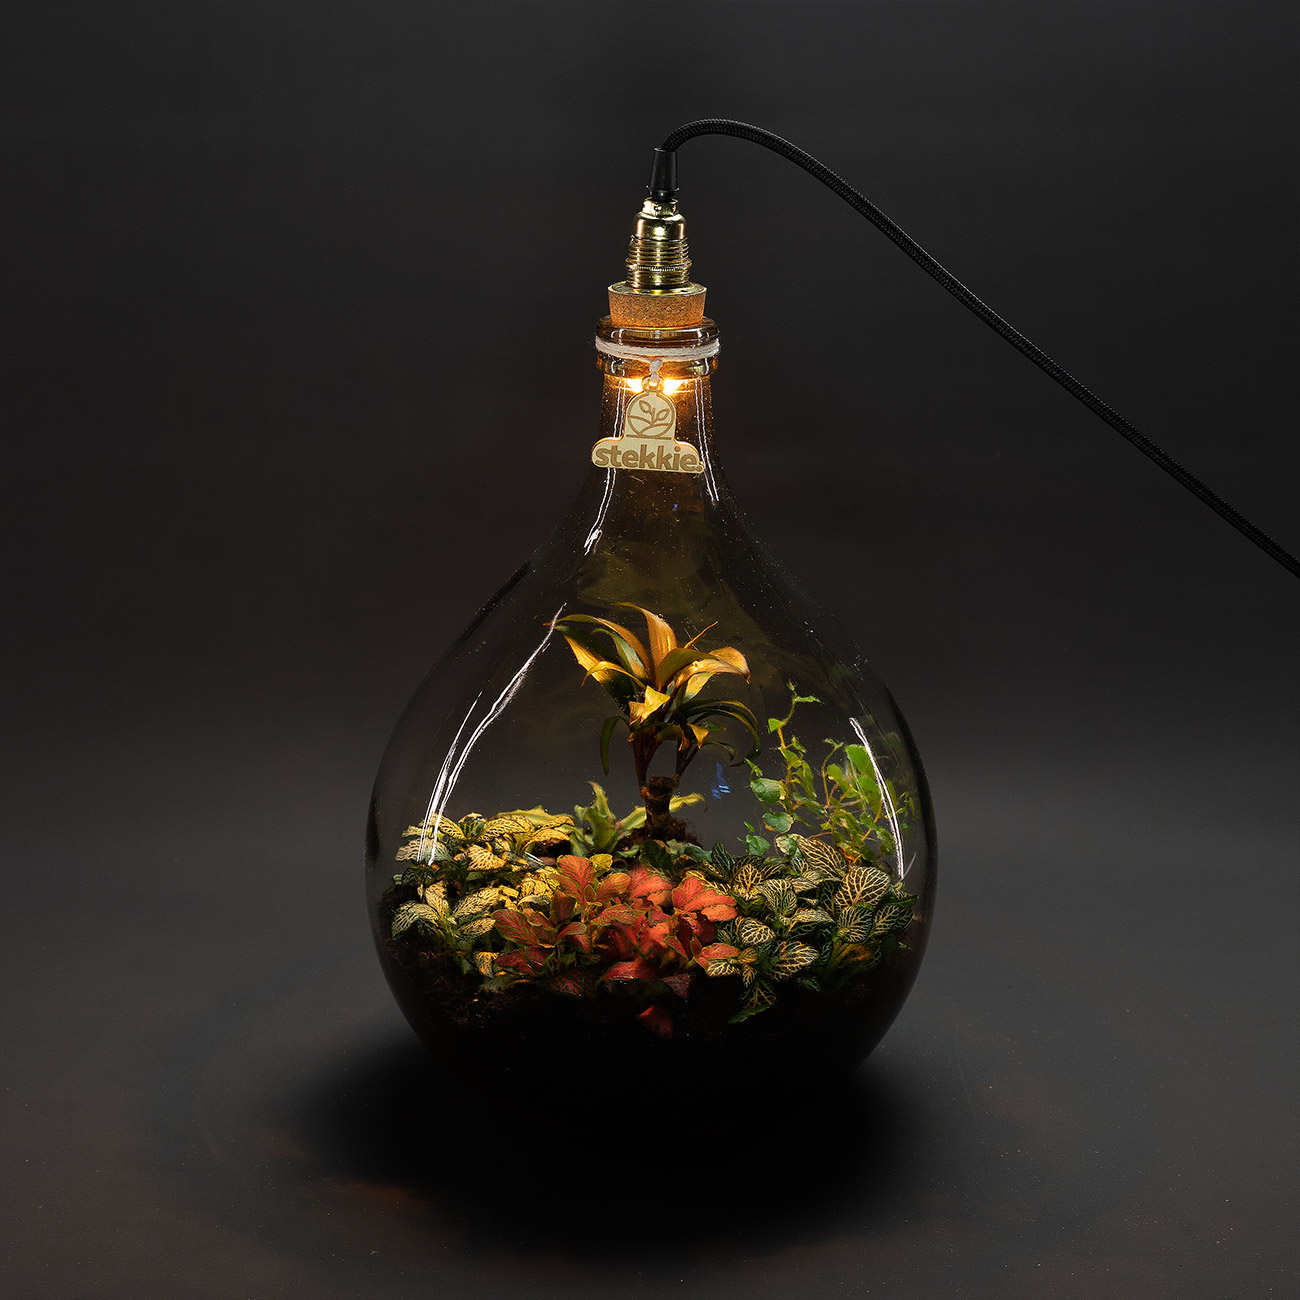 stekkie-medium-mini-ecosysteem-lamp-donker